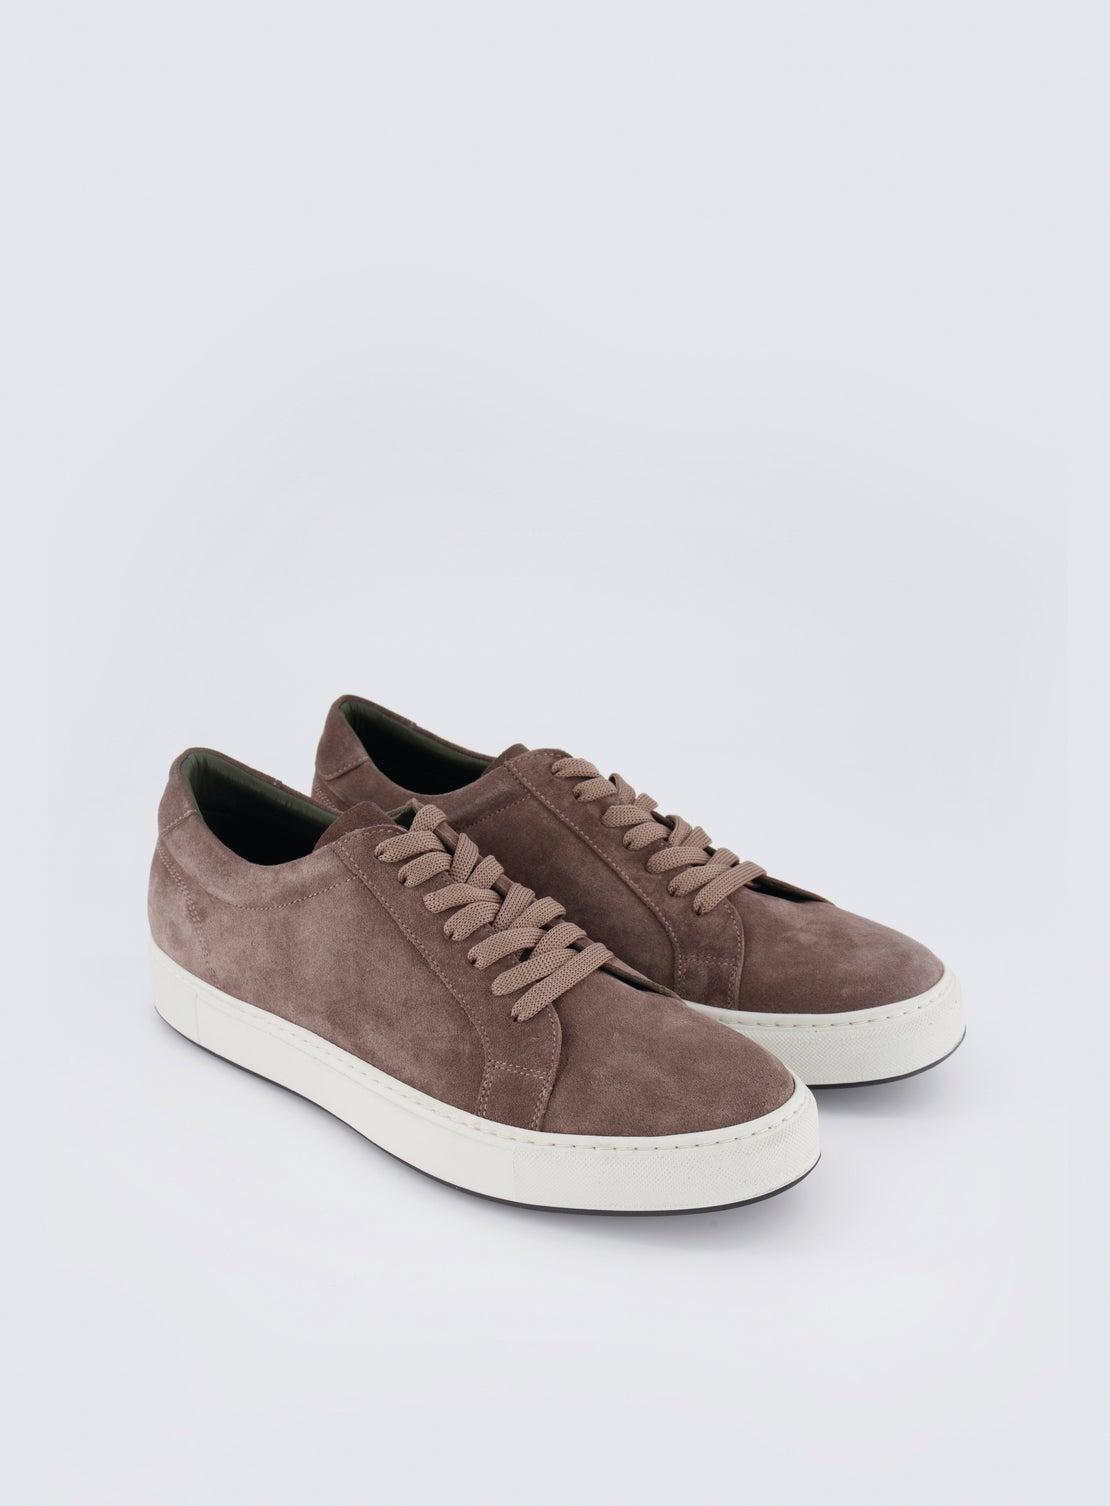 Coltrane Fawn Suede Sneaker